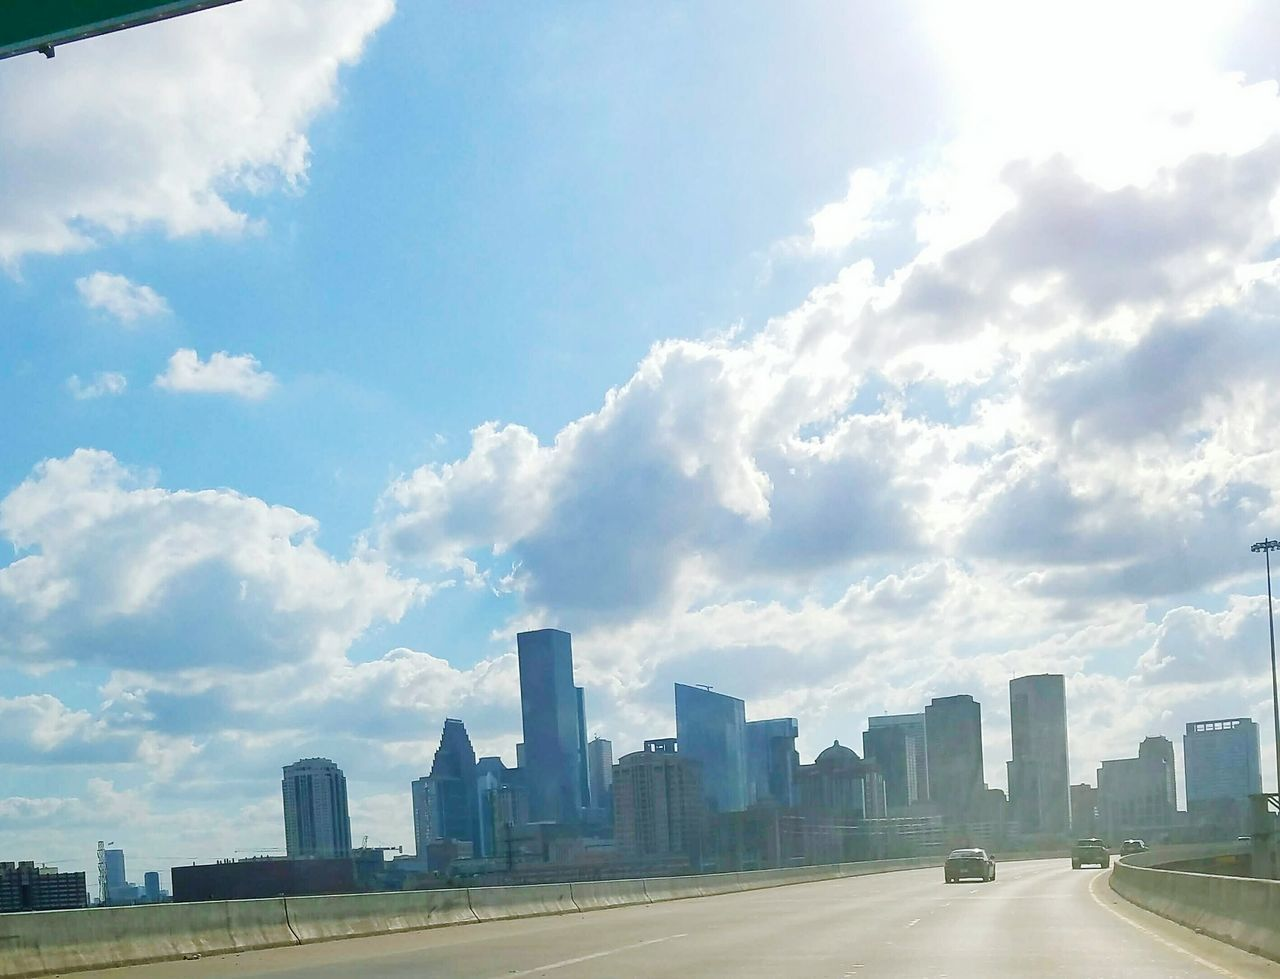 architecture, skyscraper, built structure, city, building exterior, modern, cloud - sky, urban skyline, sky, cityscape, day, outdoors, travel destinations, no people